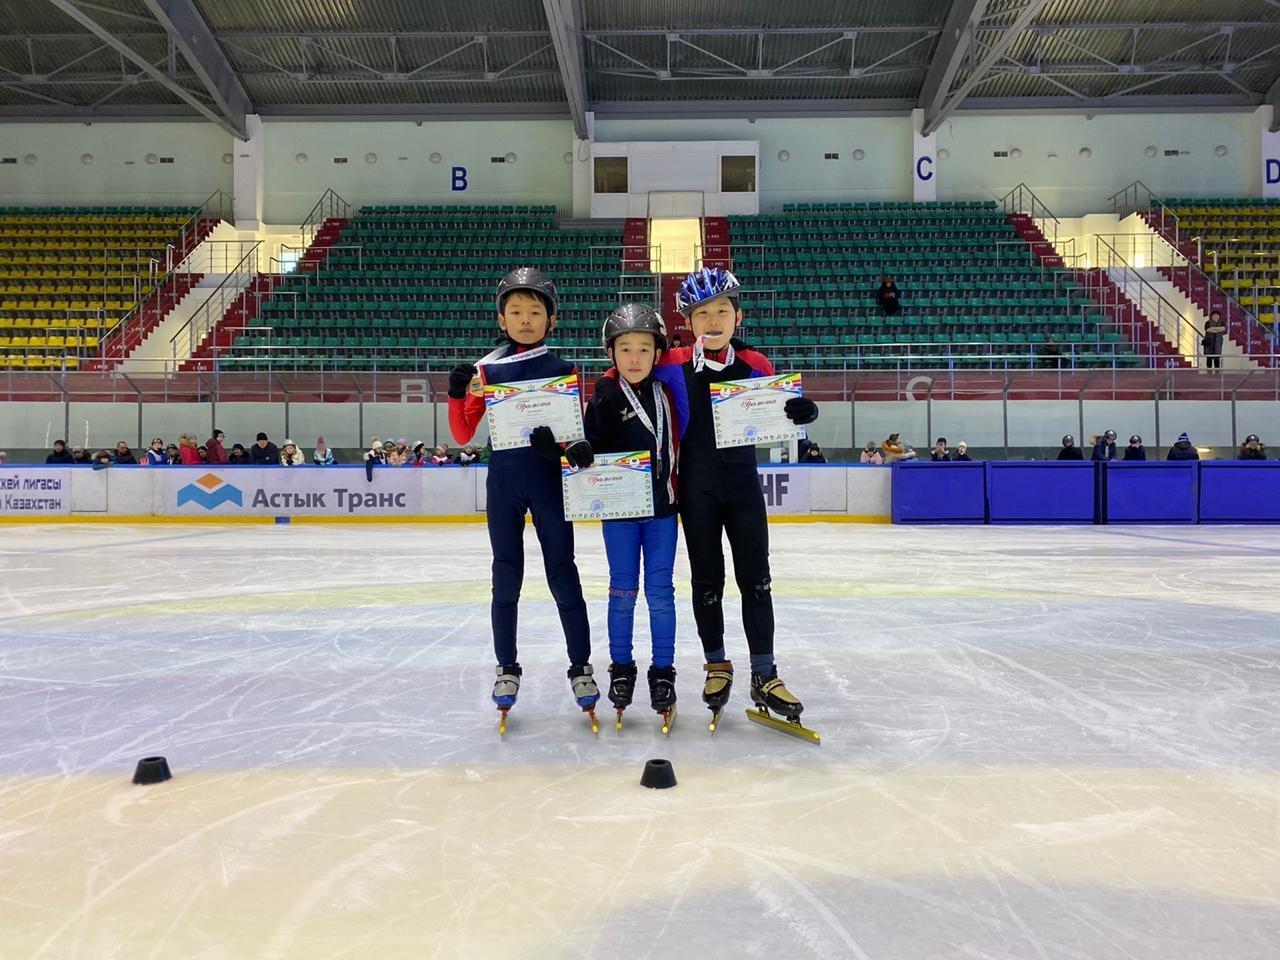 Чемпионат по жиму лёжа прошёл в Акмолинской области (фото), фото-10